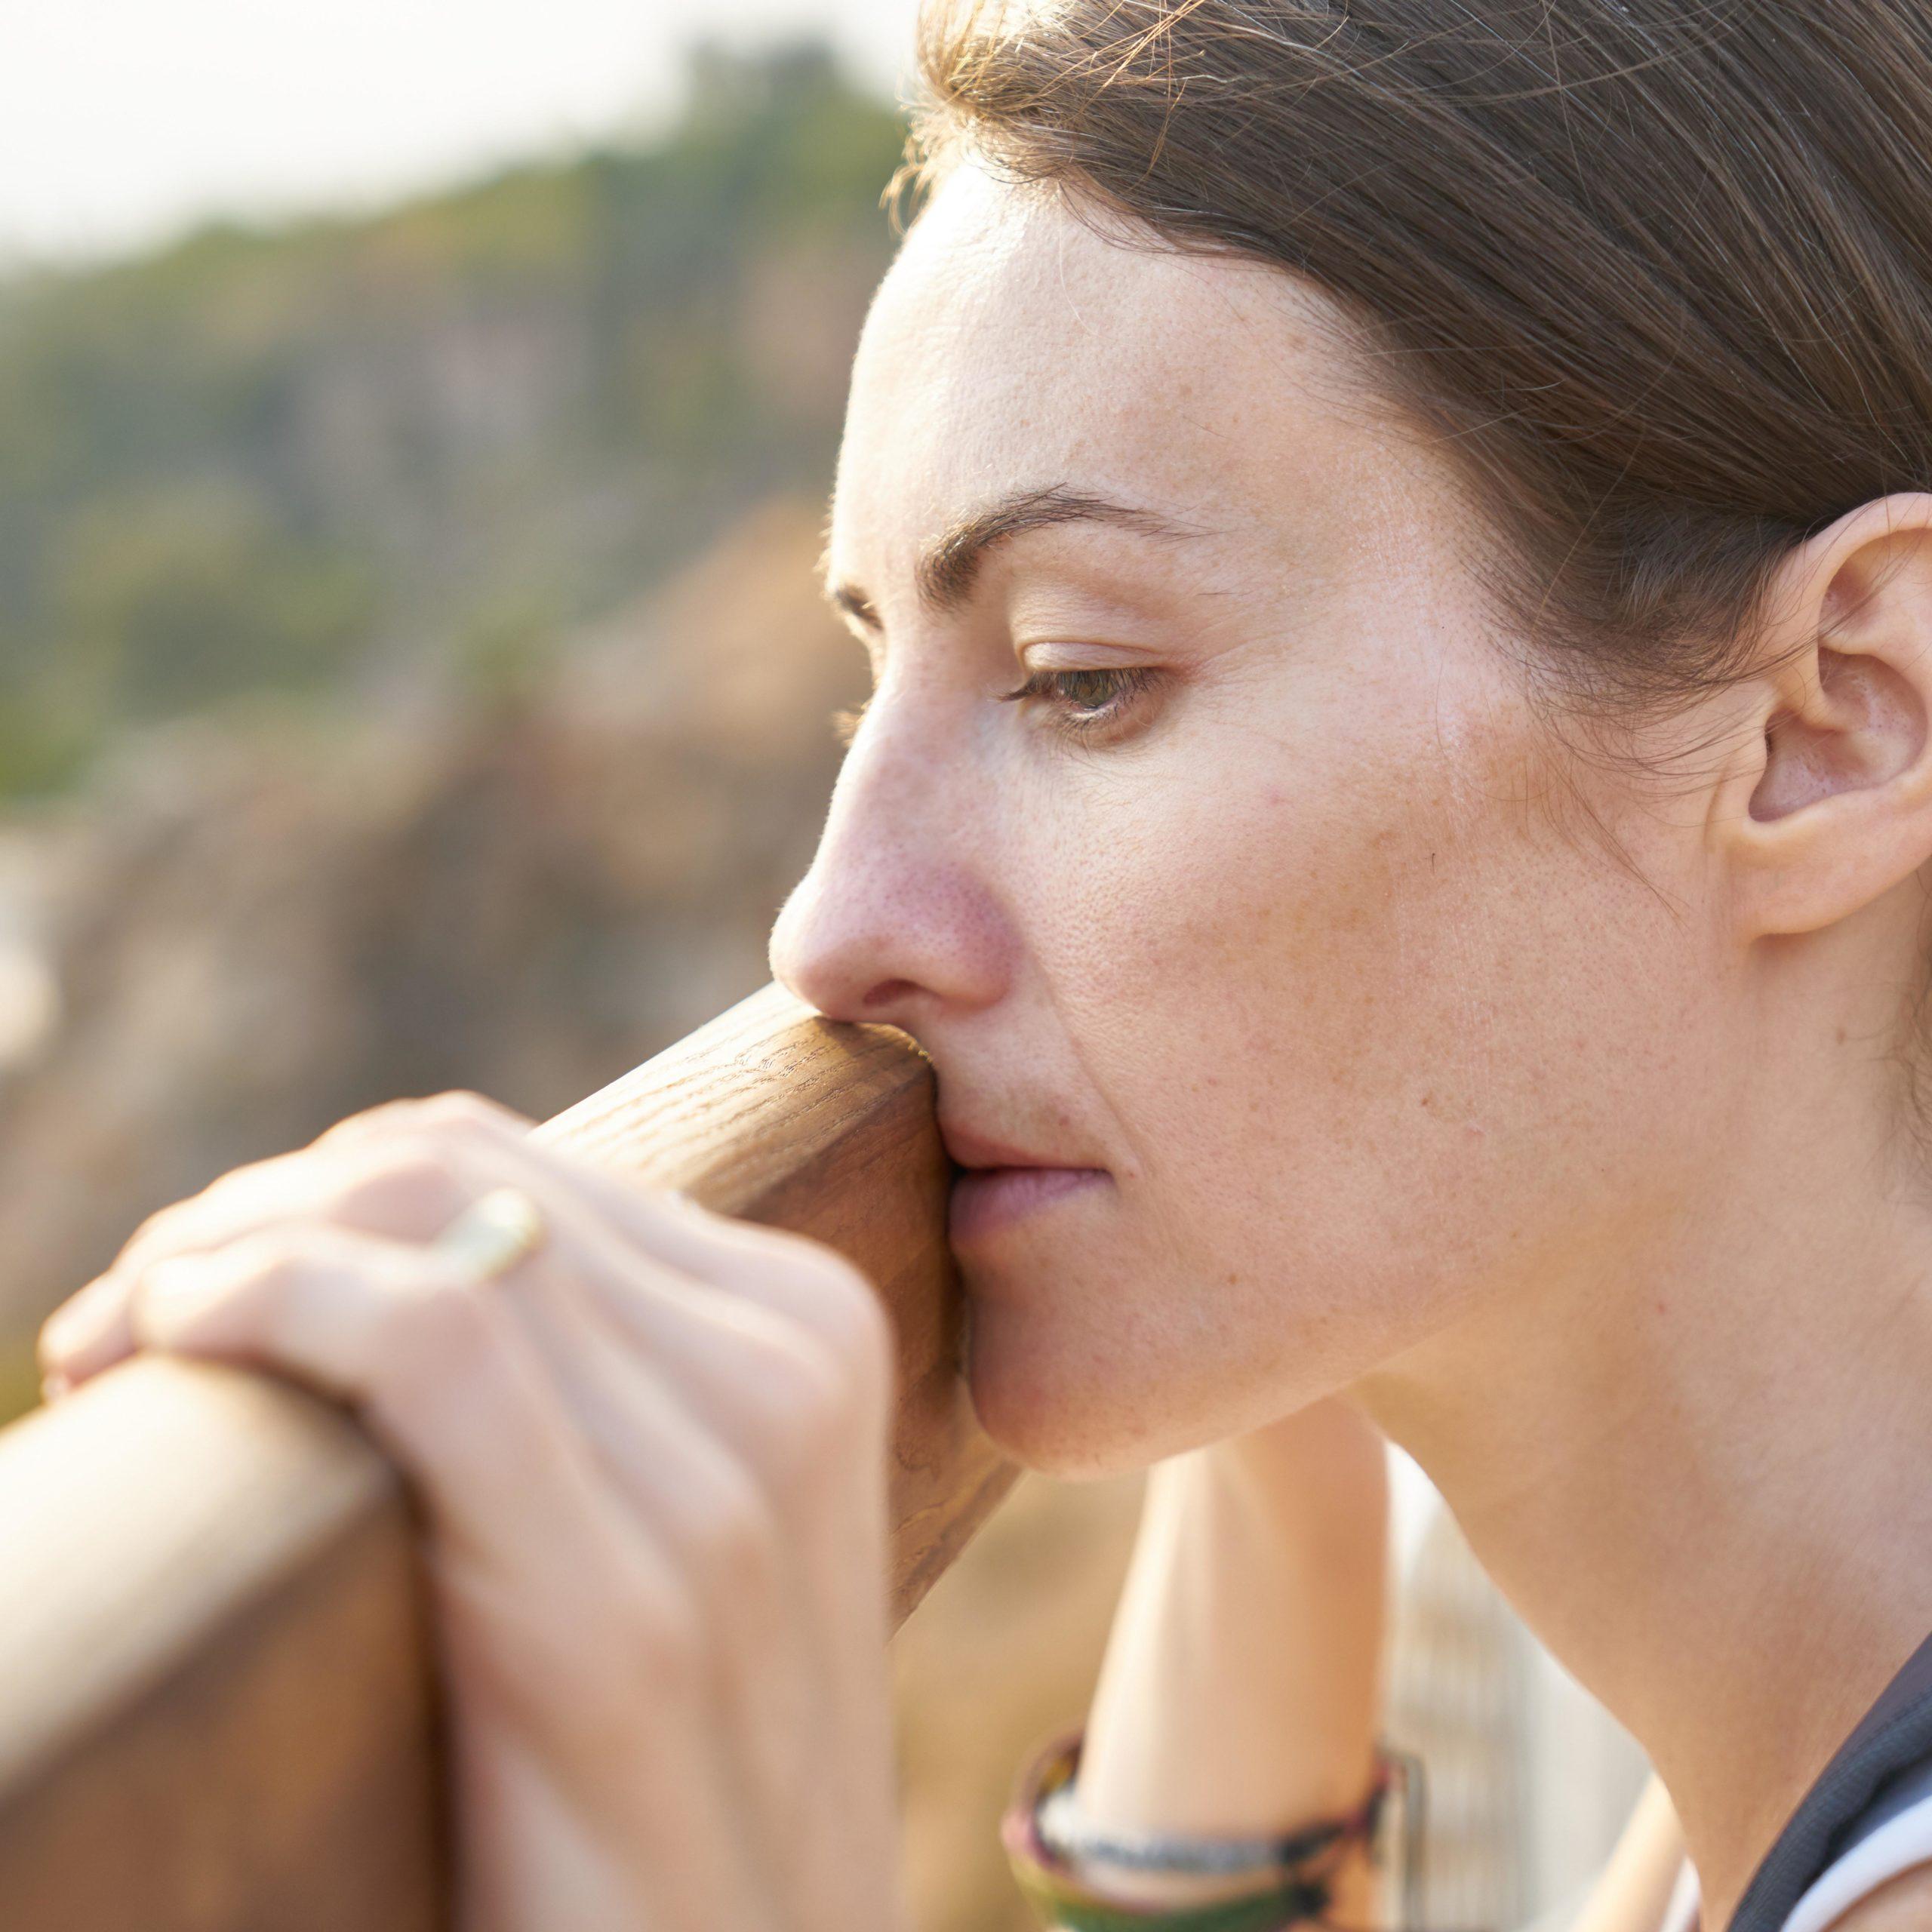 caucasian woman looking depressed